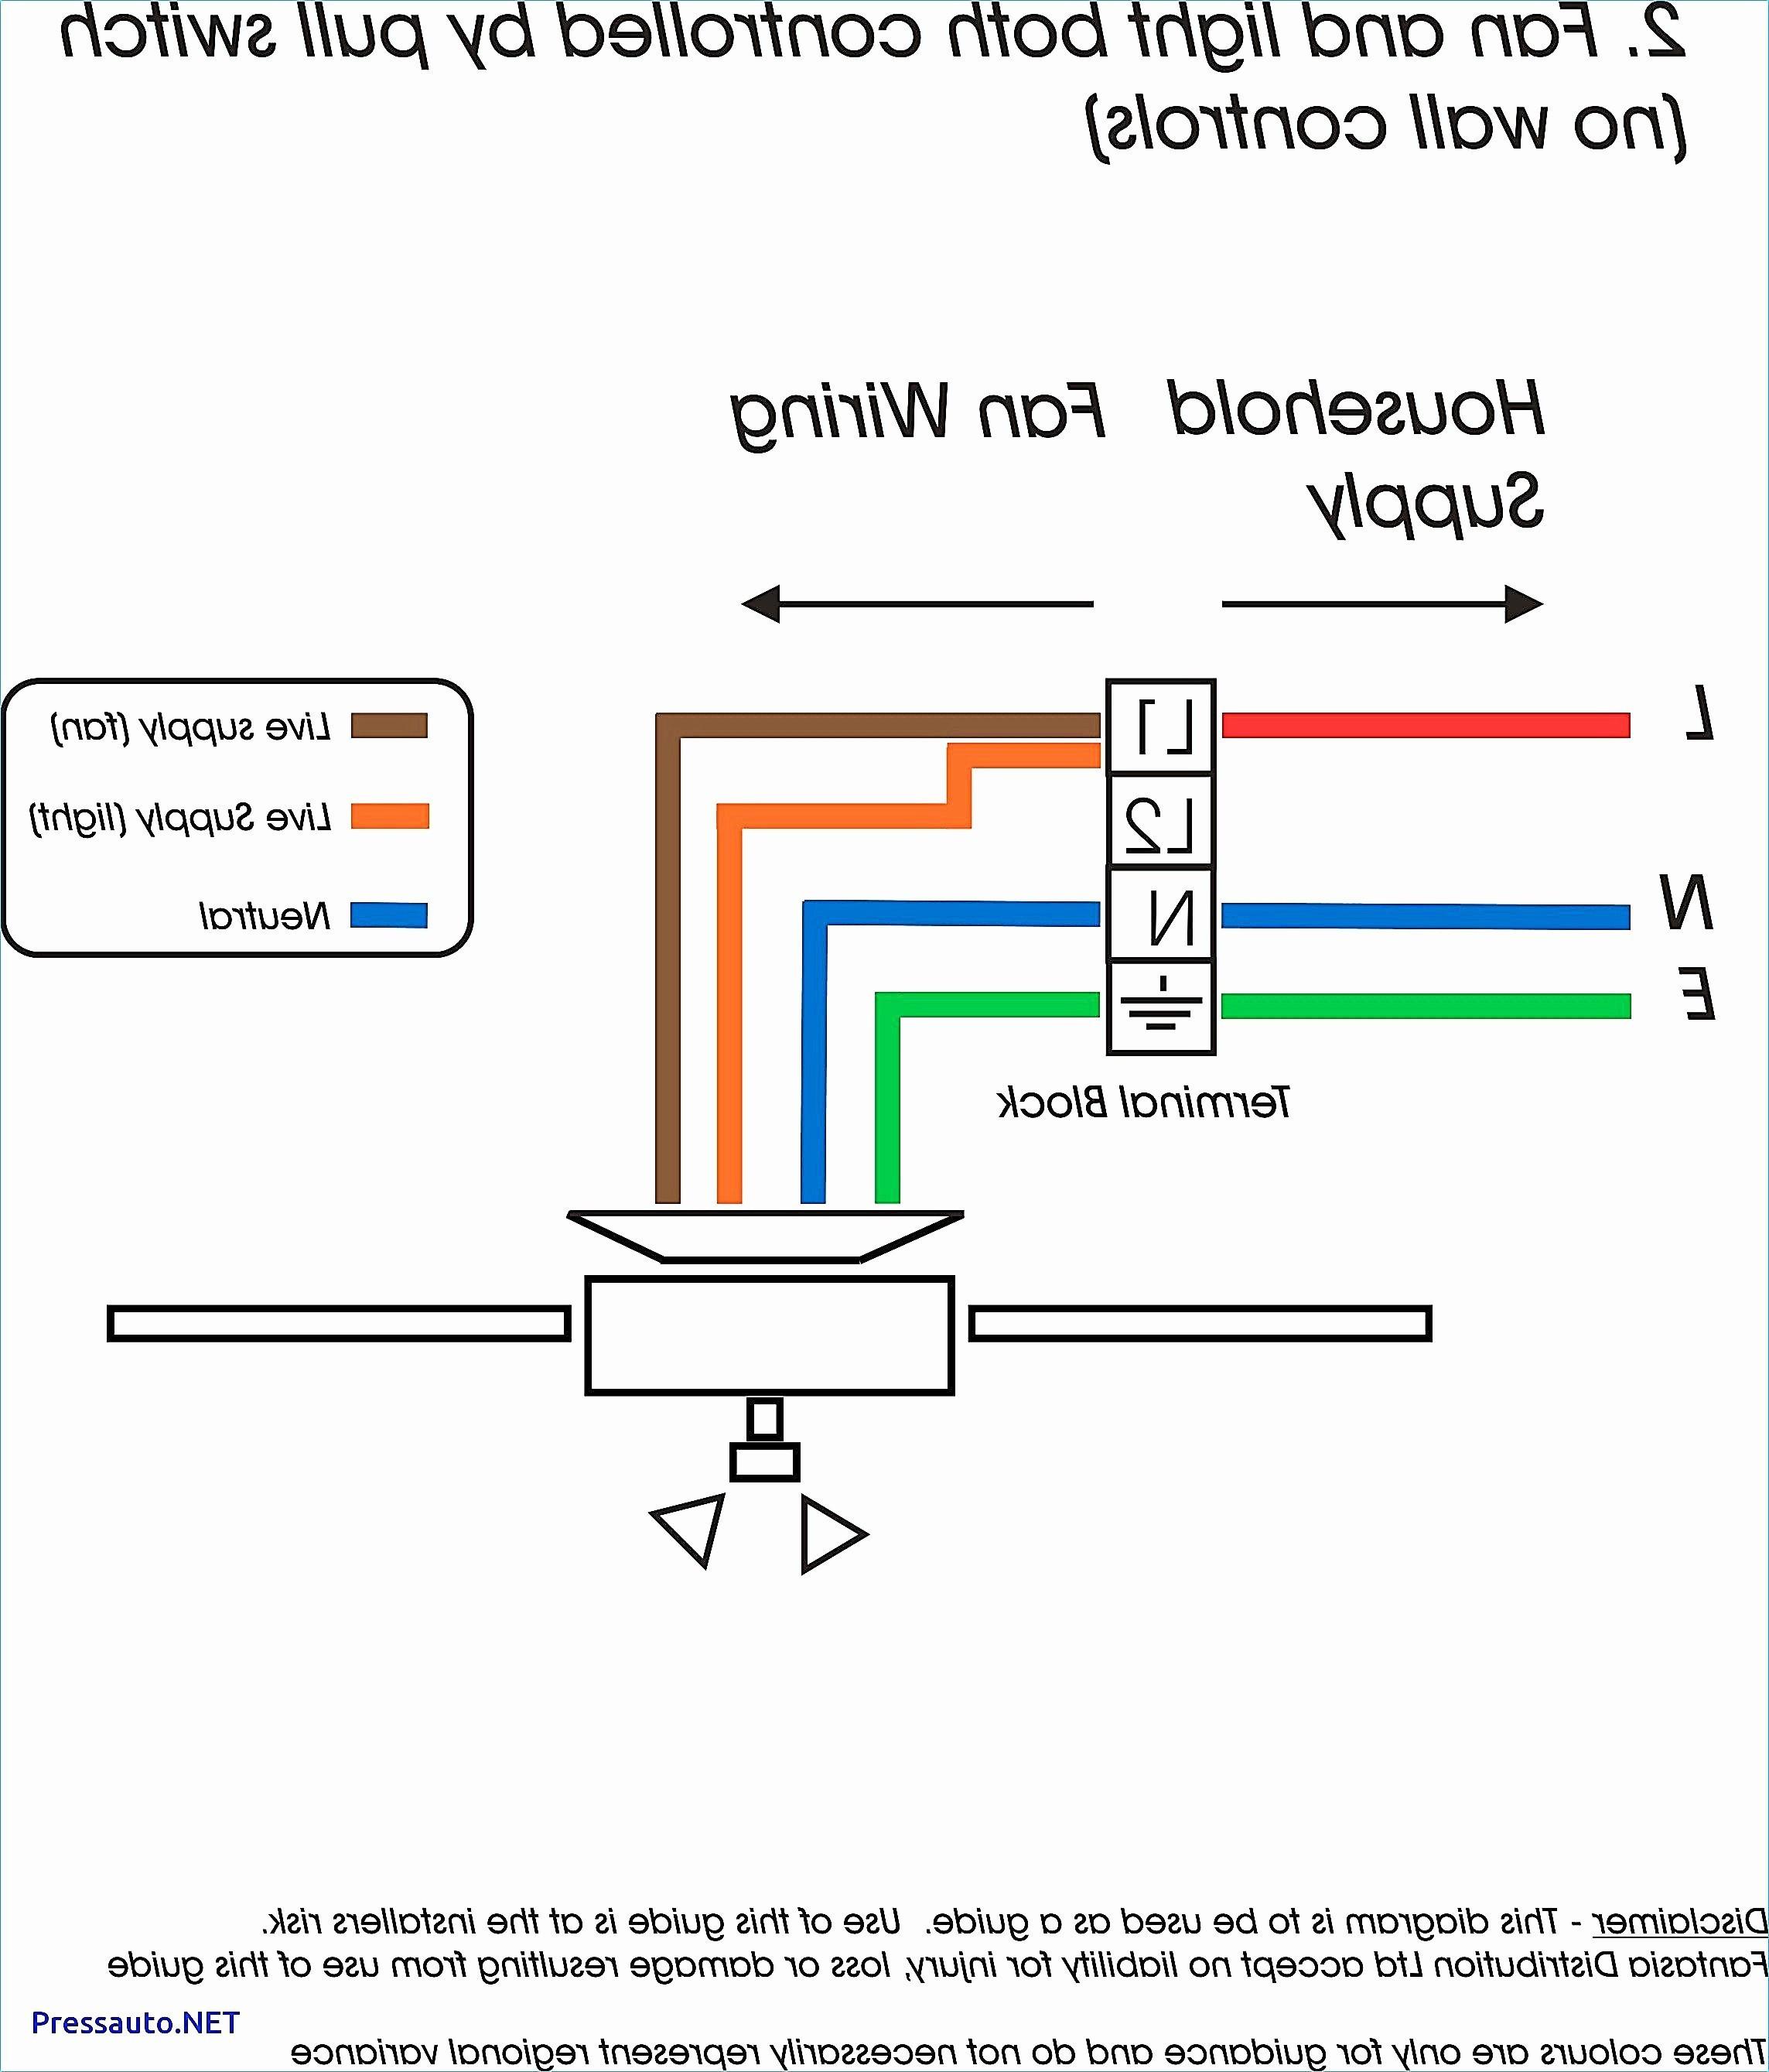 Passtime Gps Wiring Diagram Wells Cargo Trailer Wiring Diagram Mikulskilawoffices Of Passtime Gps Wiring Diagram